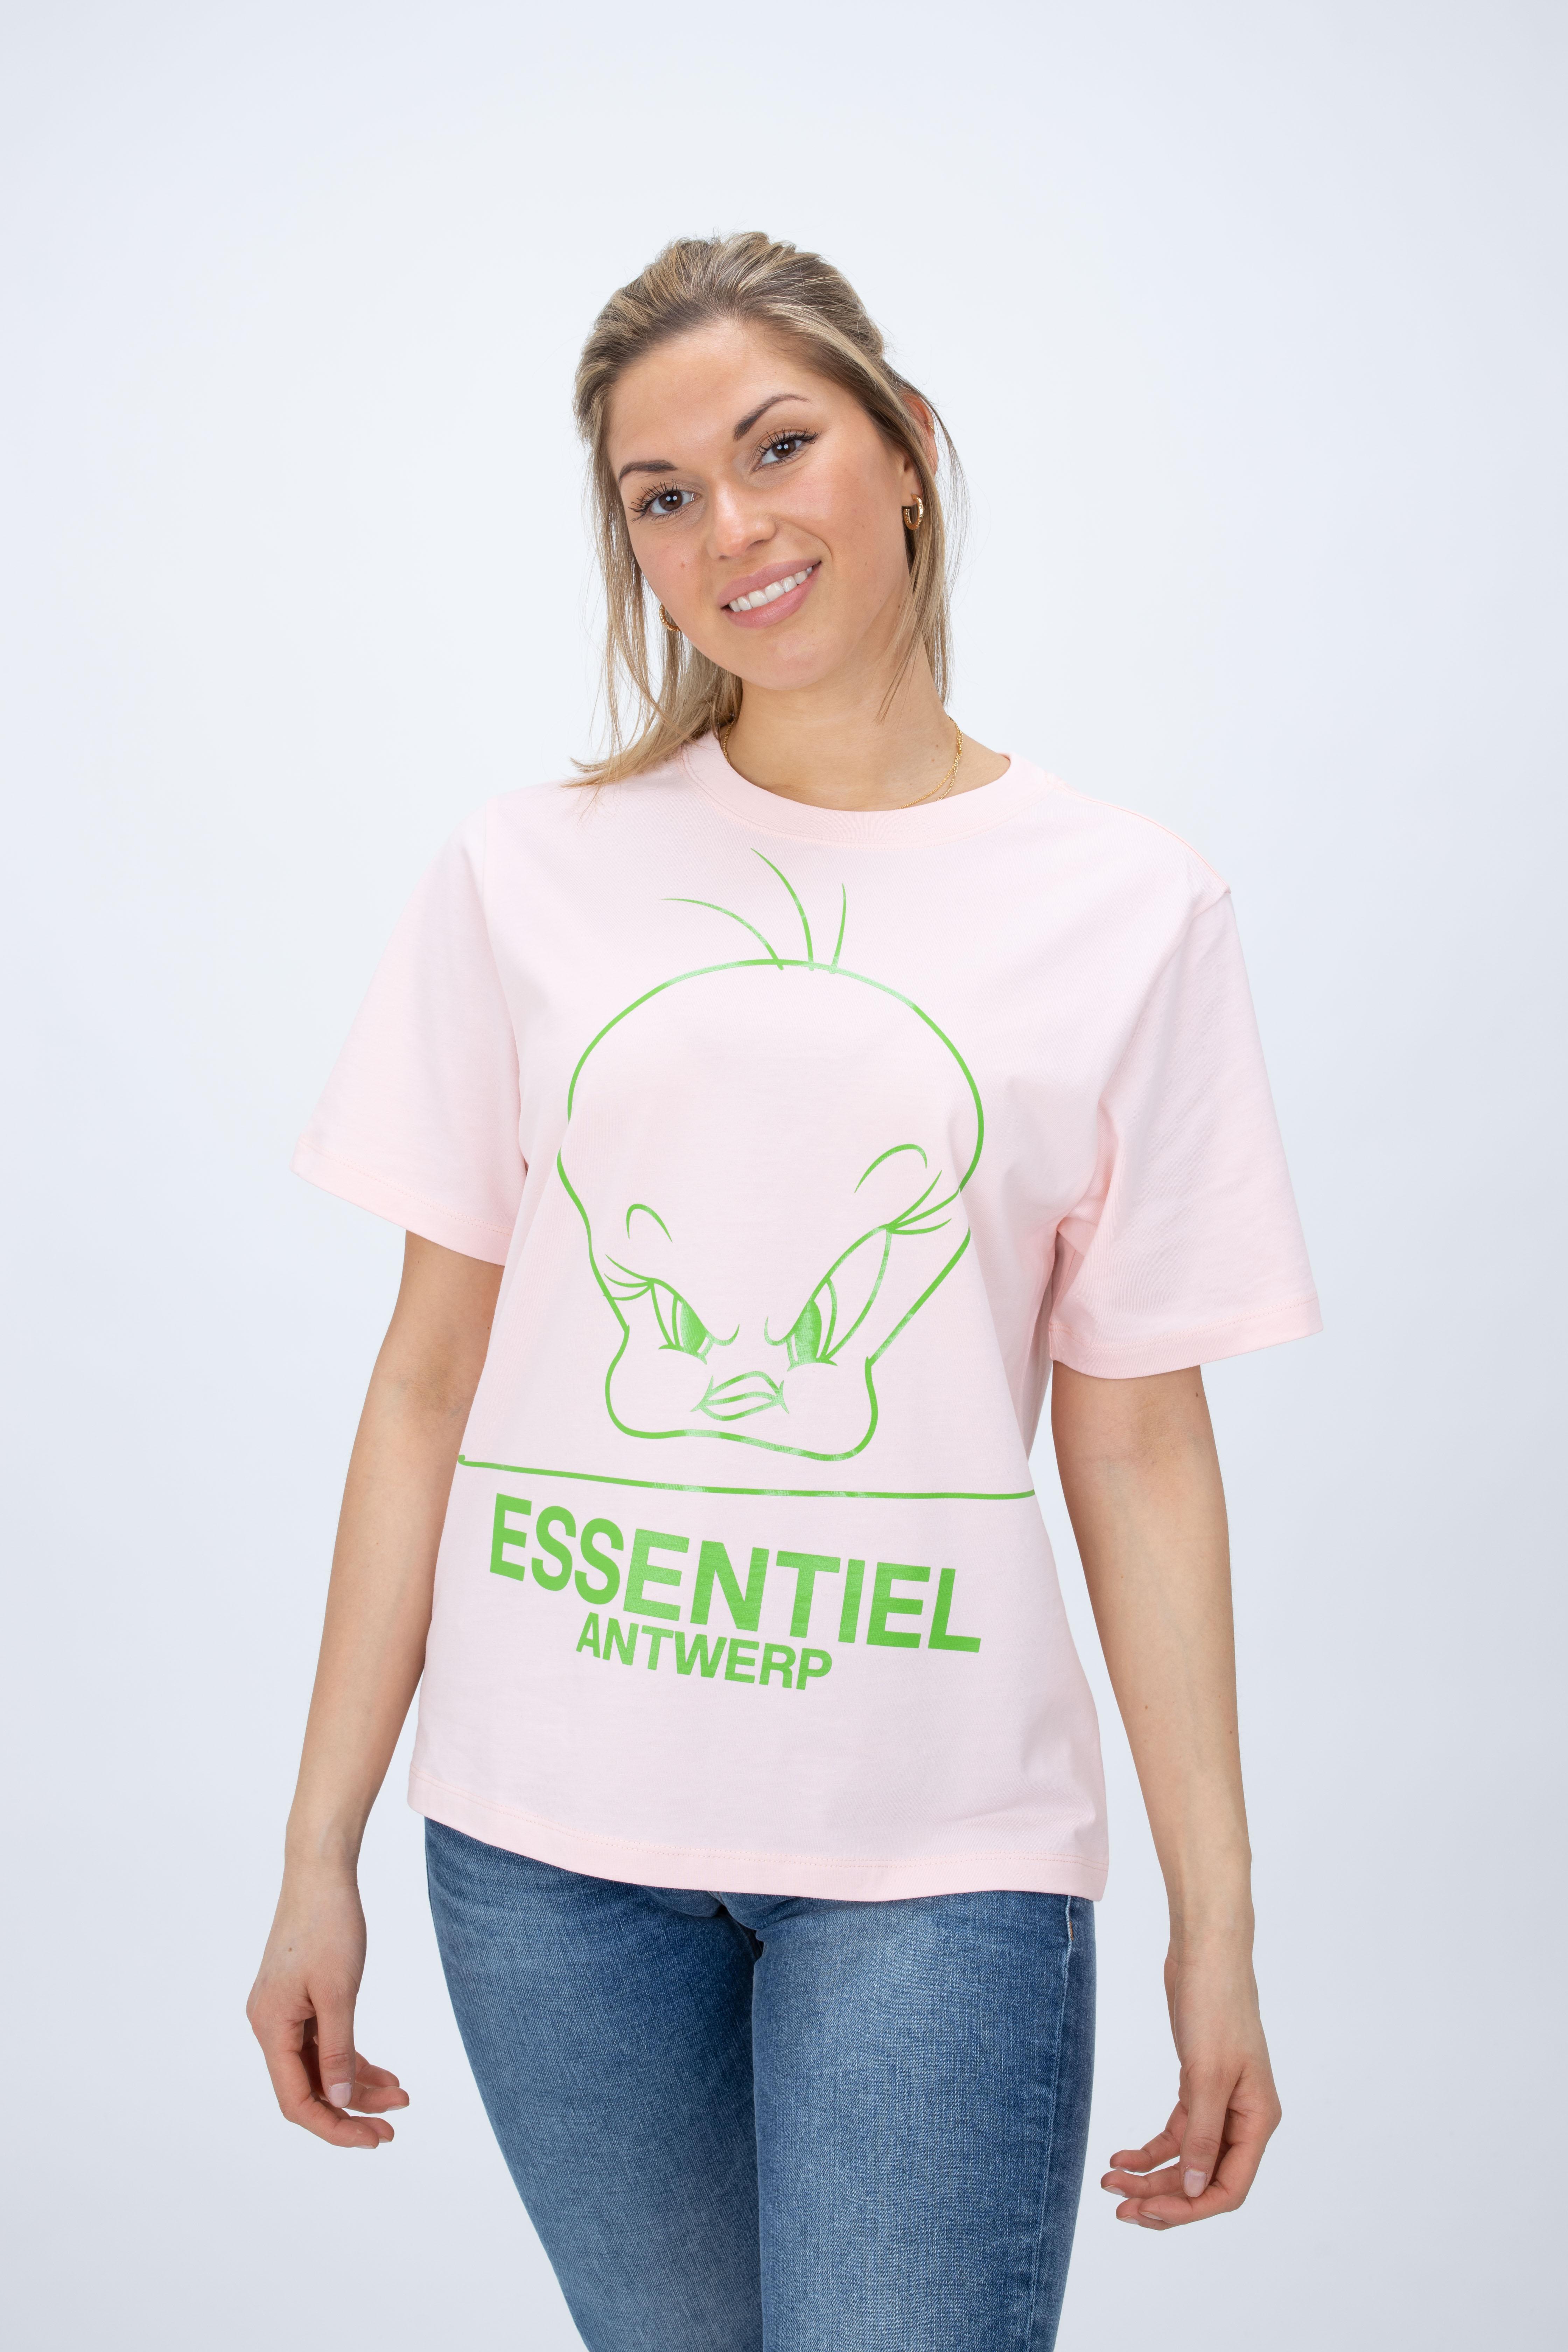 T-Shirt Zinker mit Looney-Print